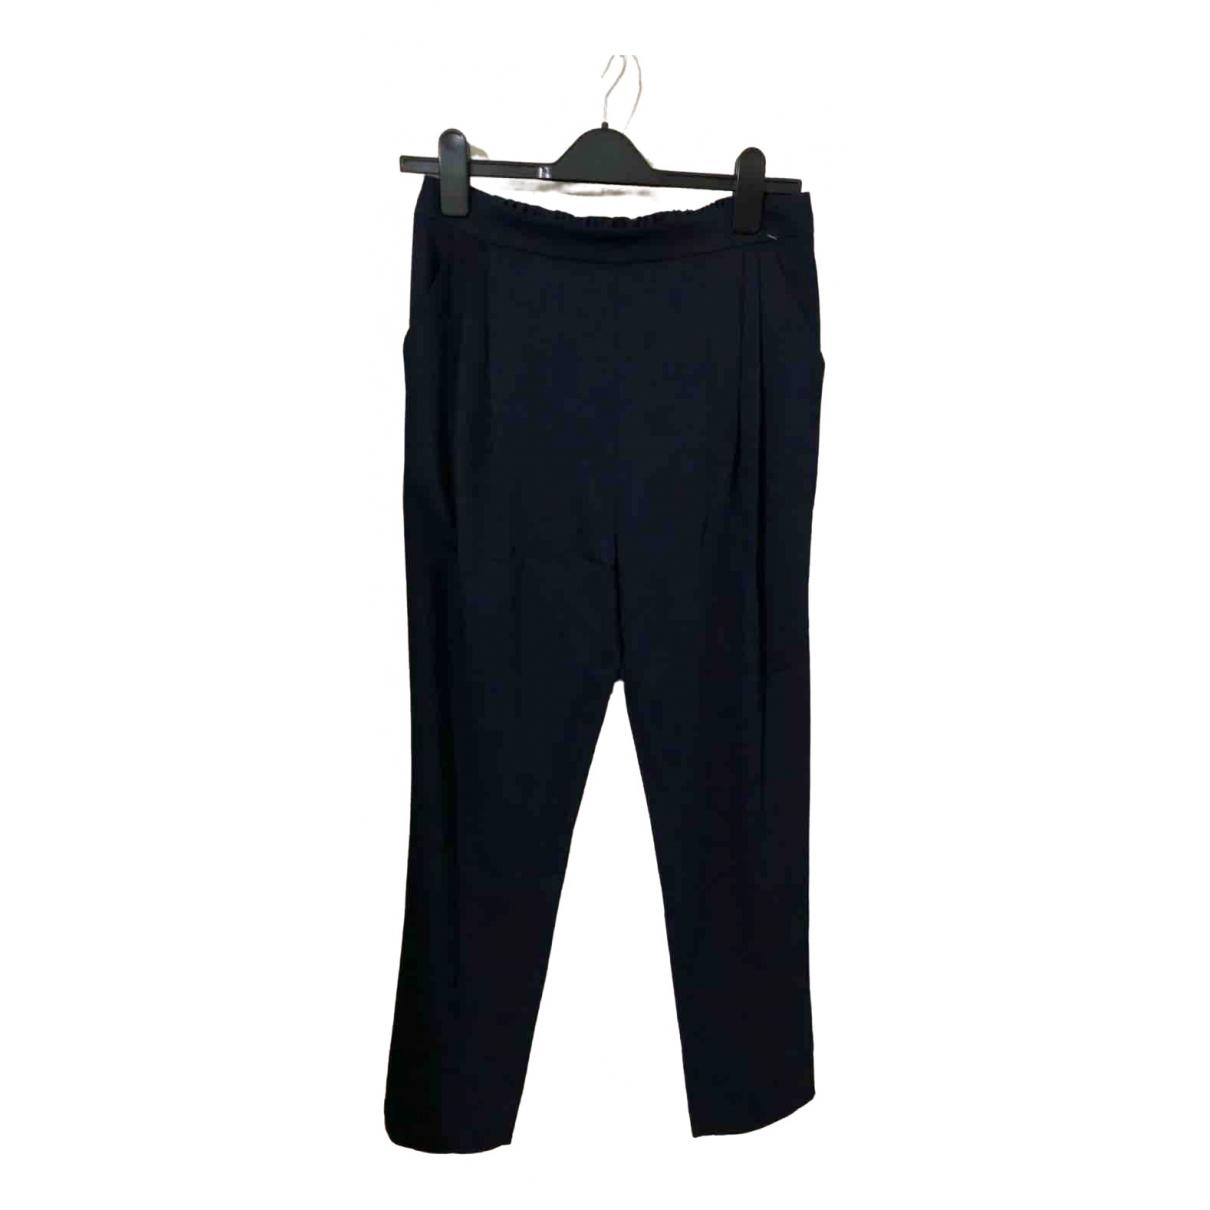 Derek Lam \N Navy Trousers for Women 4 US